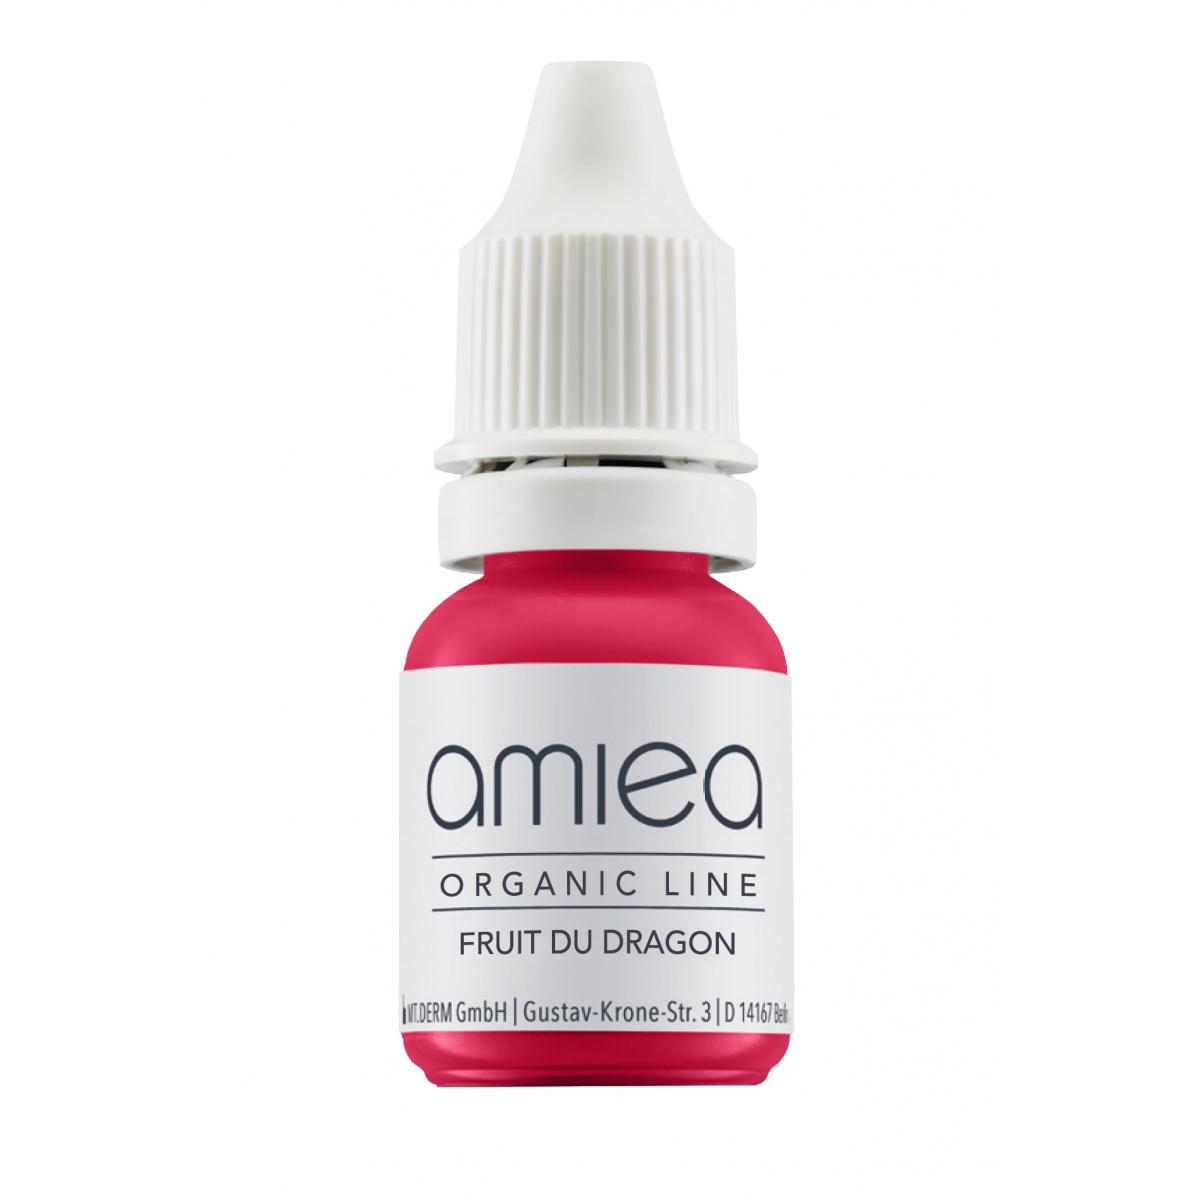 Organicline (5 ml)  - PIGMENTS AMIEA ORGANICLINE FRUIT DU DRAGON, Flacon 5 ml